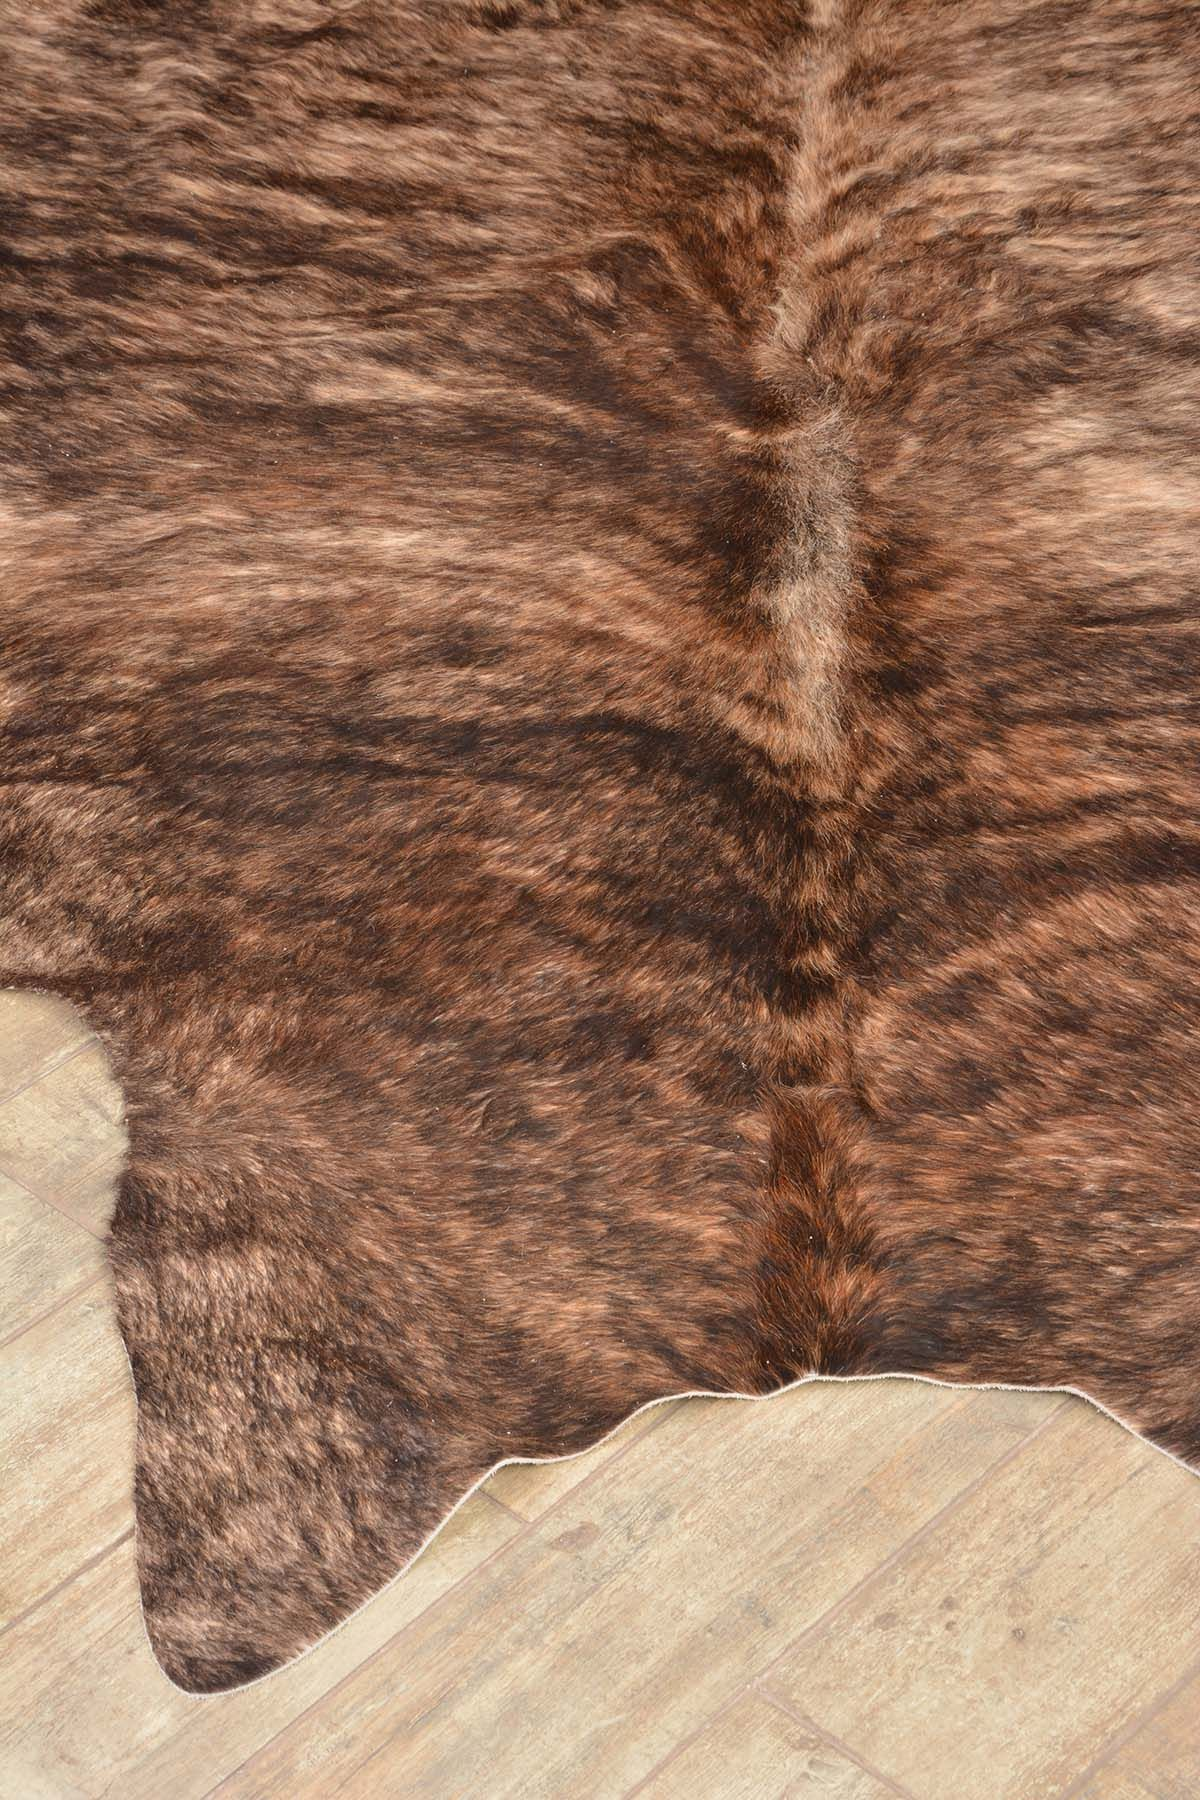 Ergogan Deri Rug From Genuine Buffalo Leather Brown